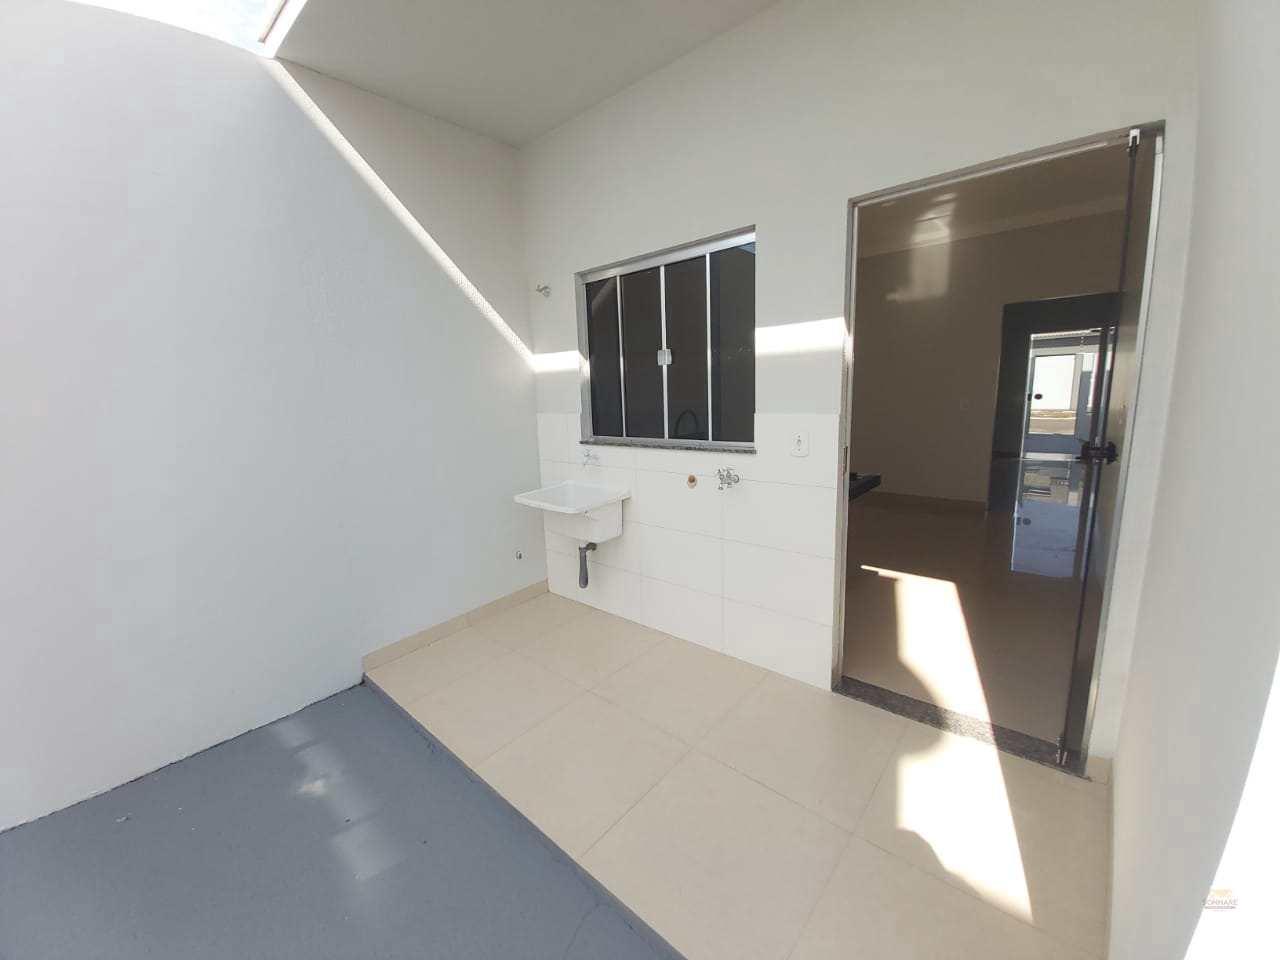 Casa com 2 dorms, Buritis II, Primavera do Leste - R$ 320 mil, Cod: 407